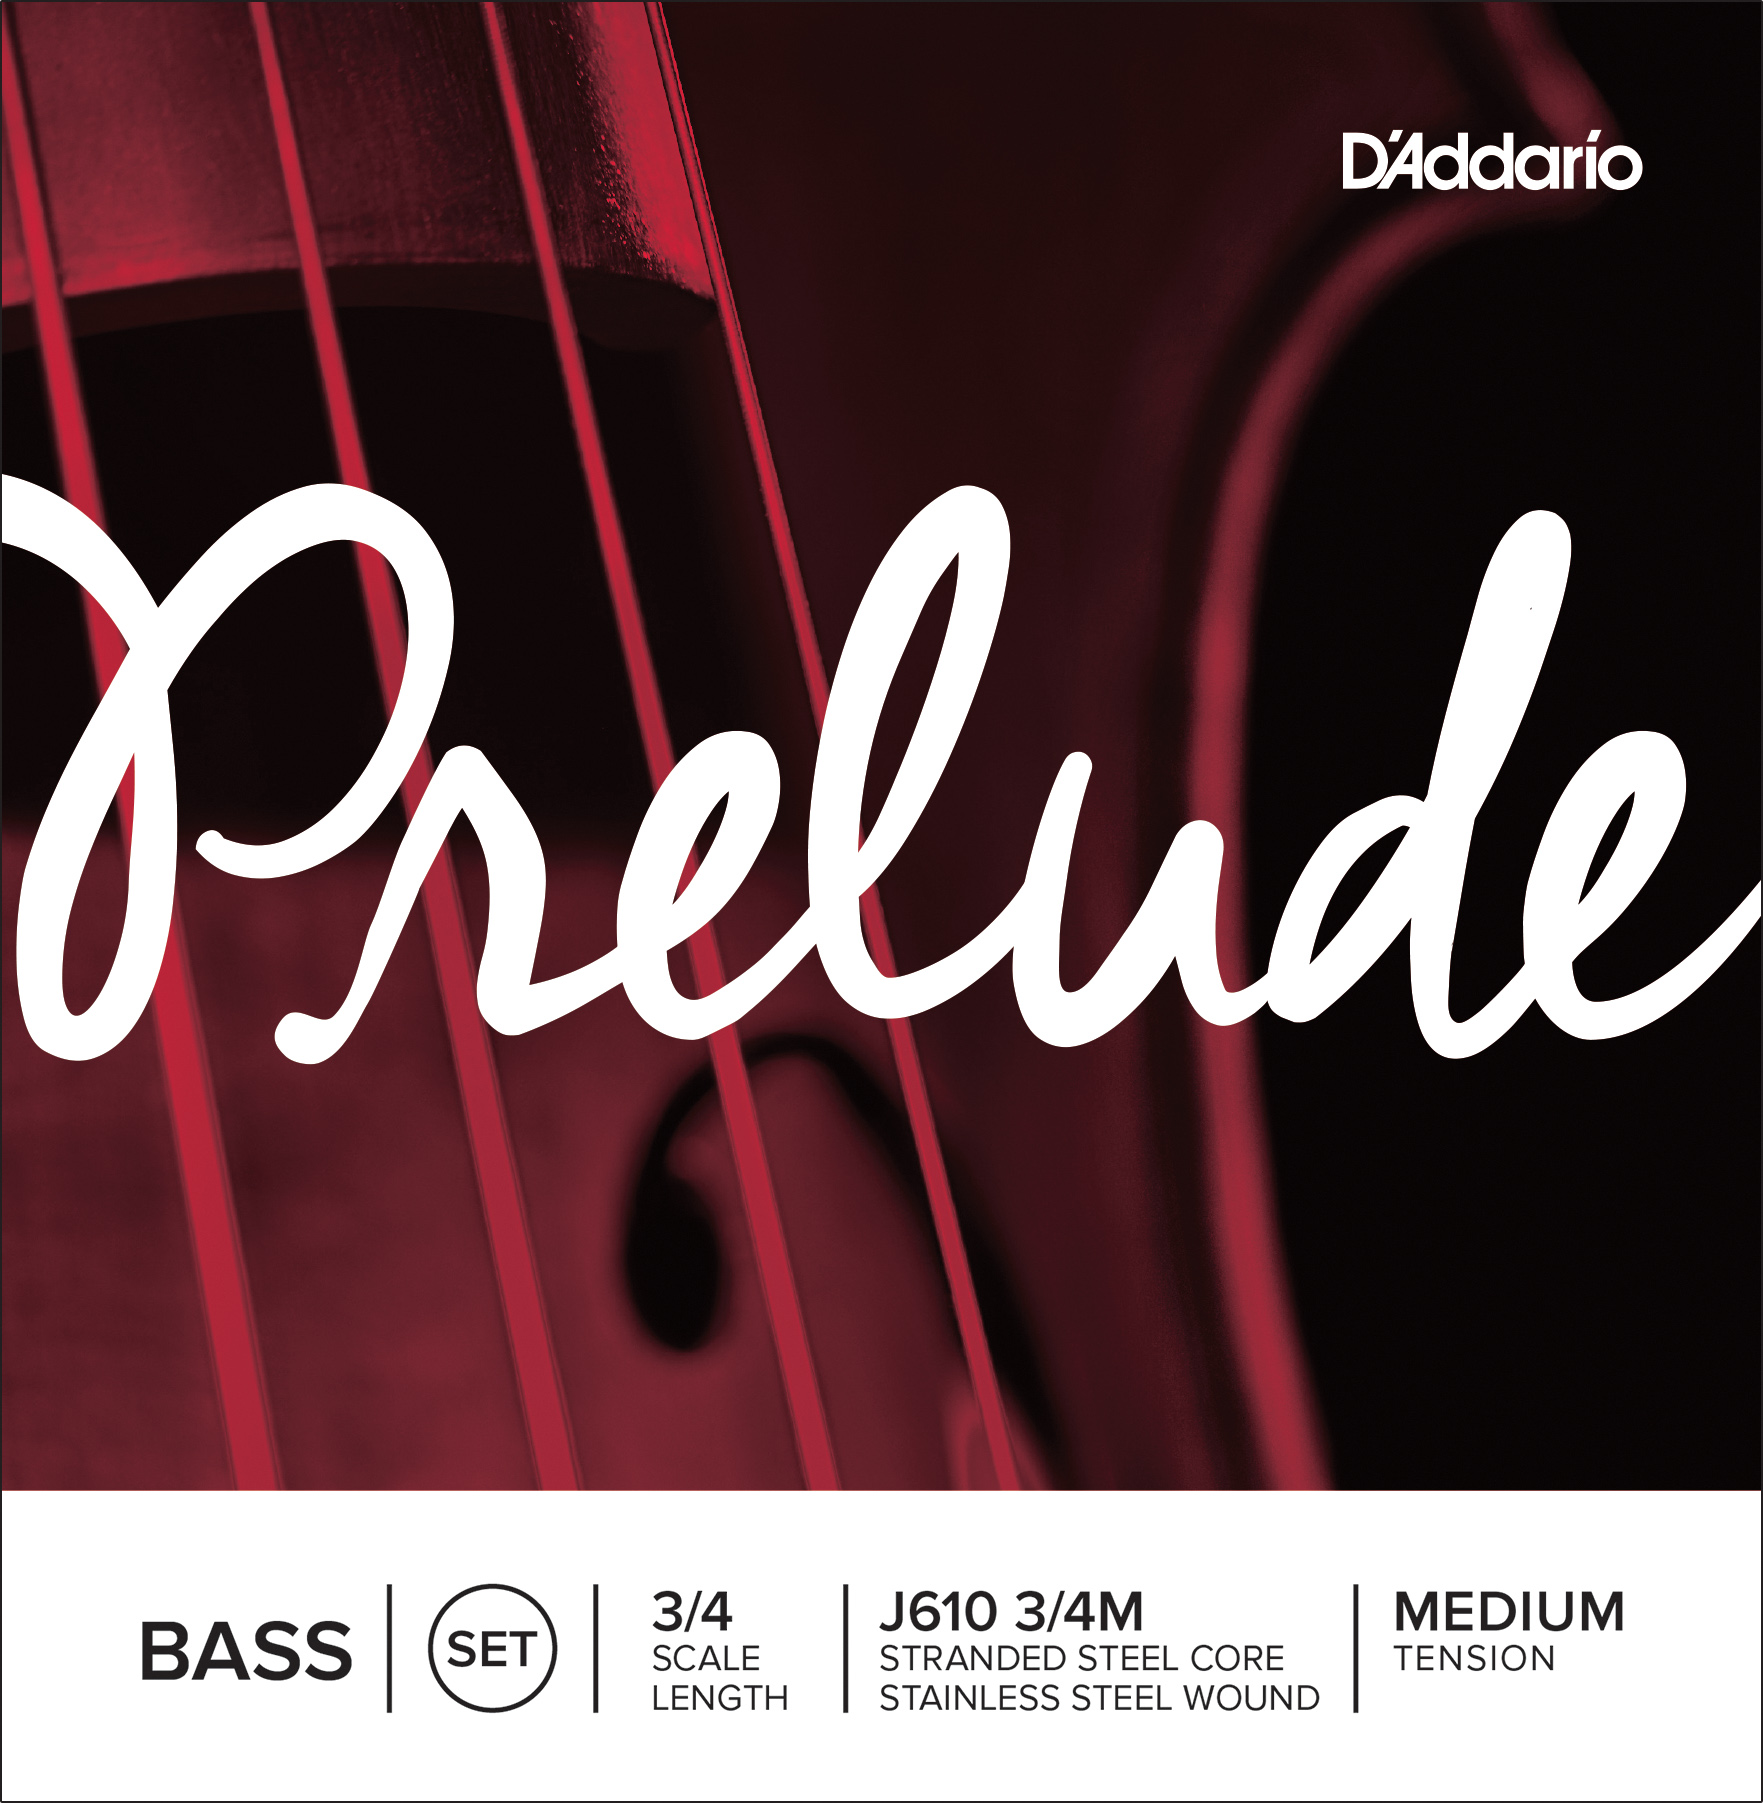 D'Addario Prelude Bass String Set 3/4 Scale Medium Tension